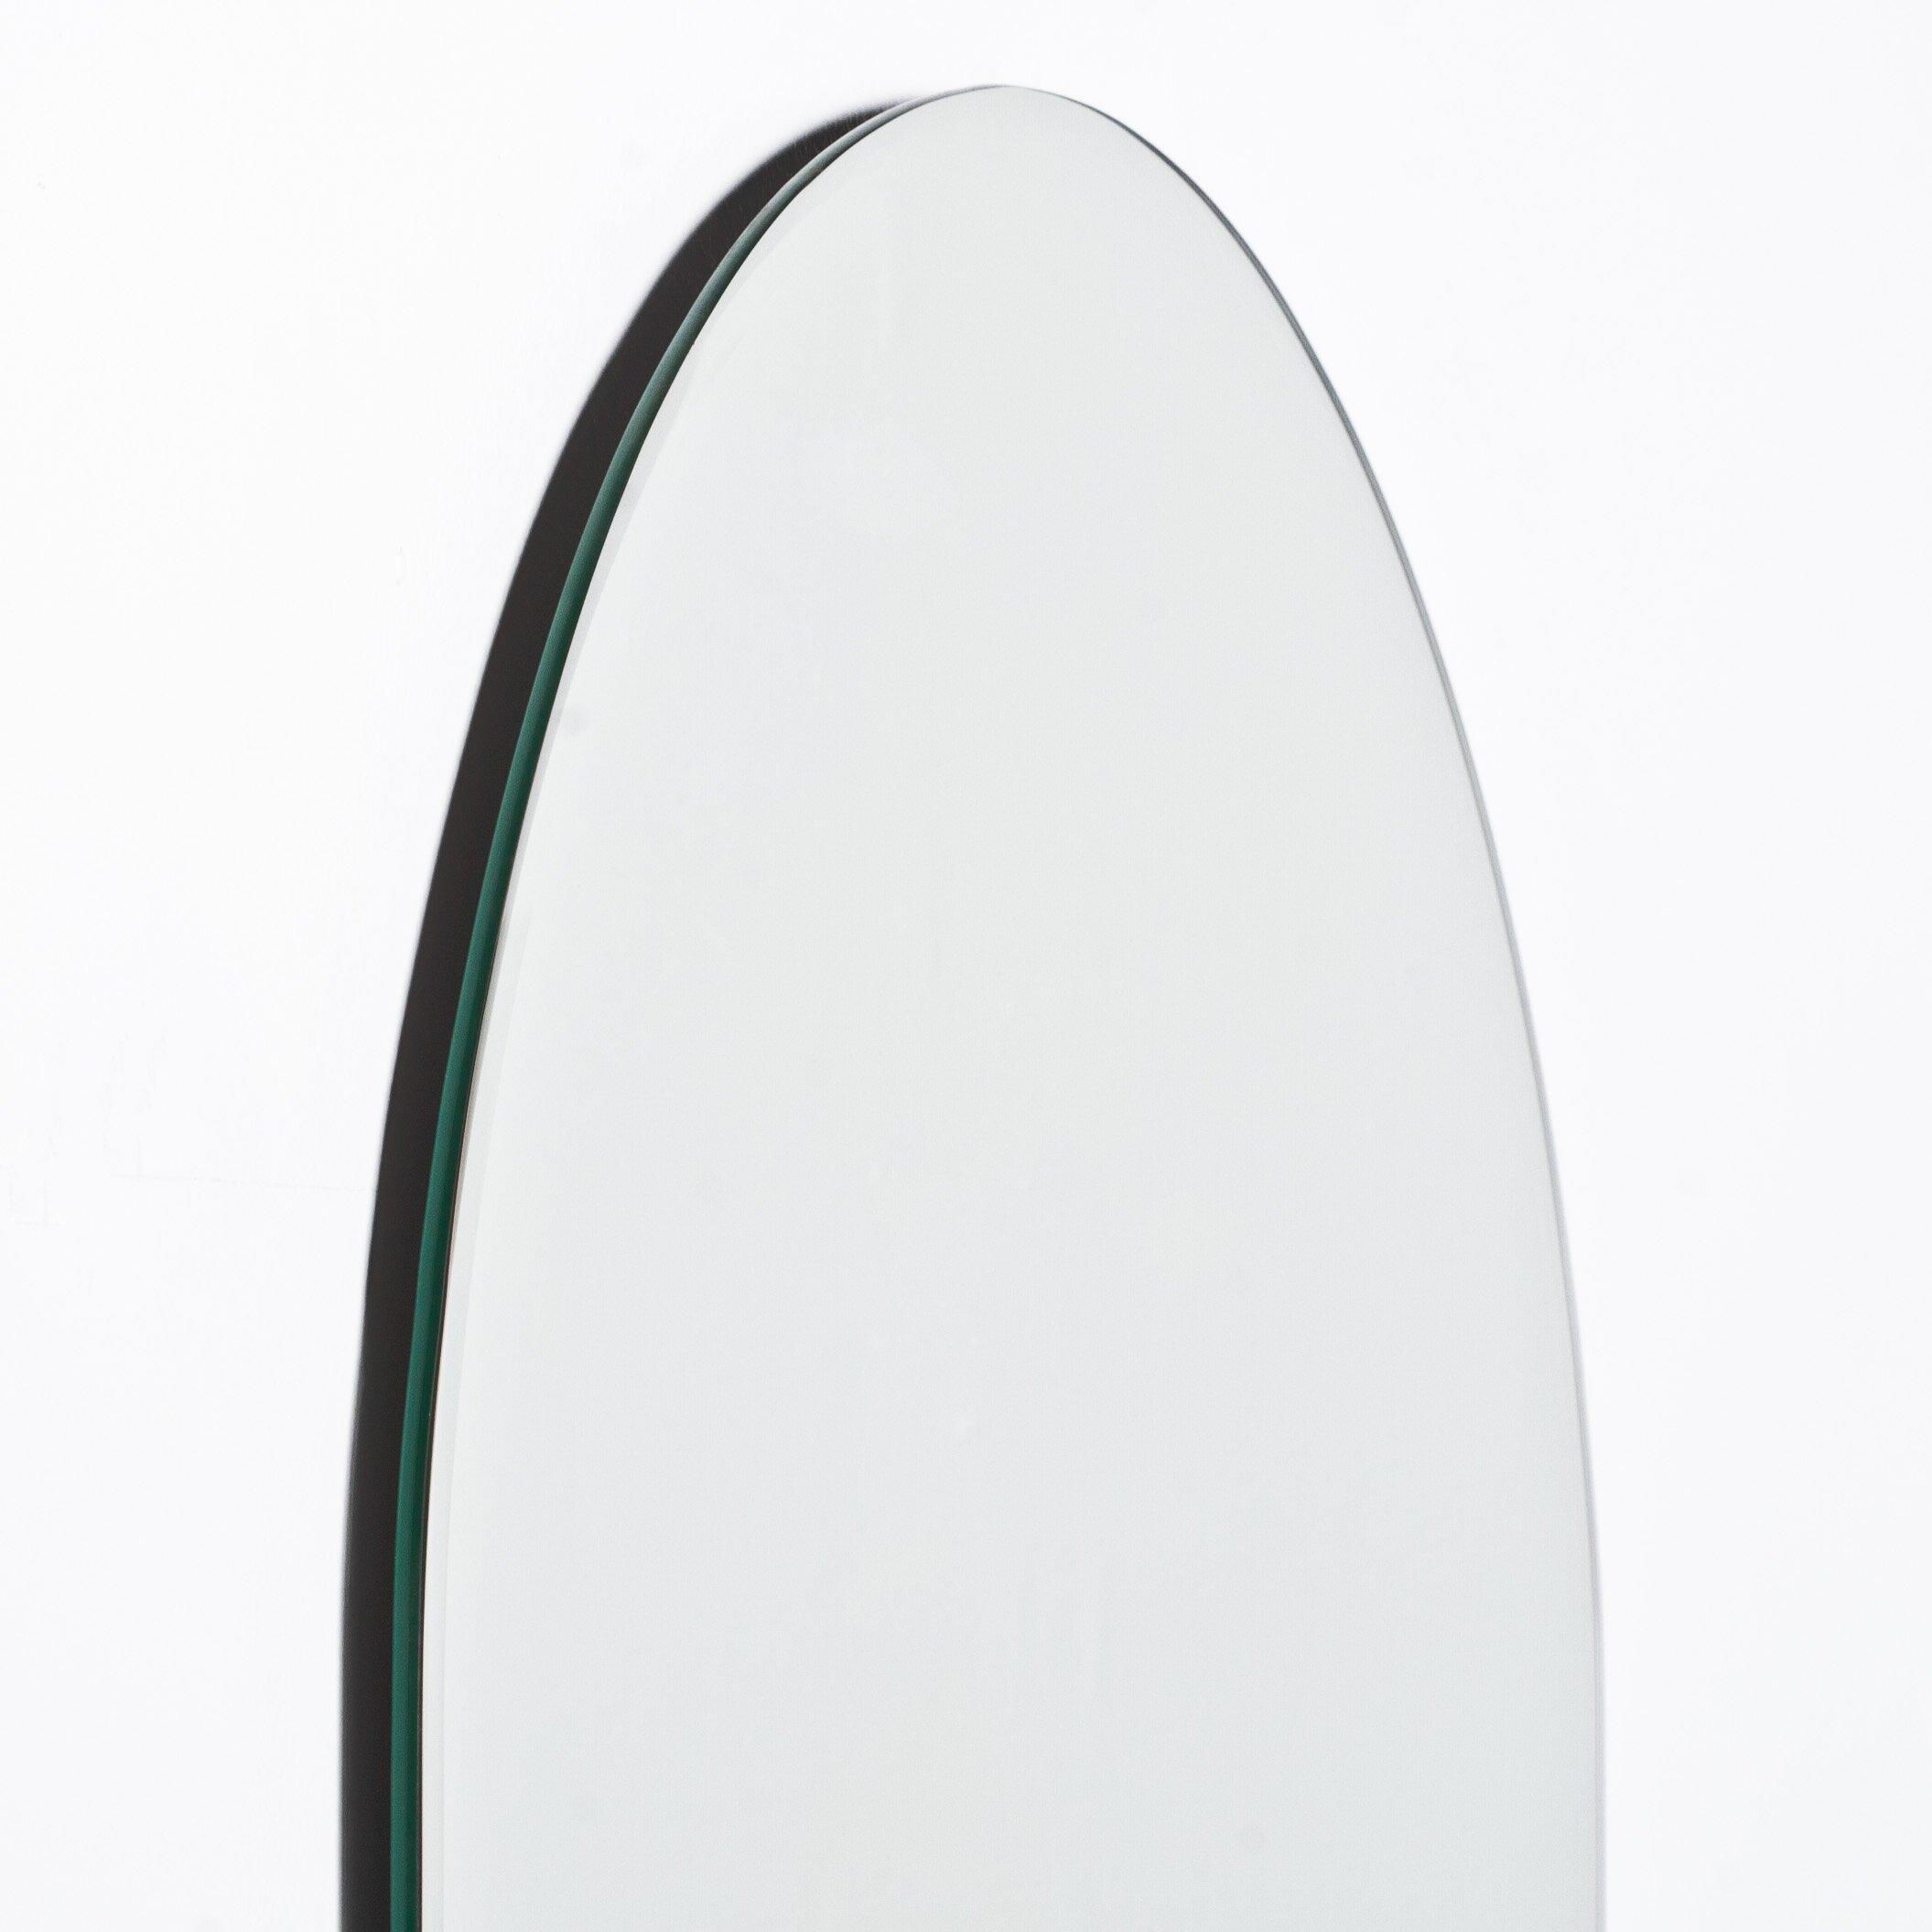 Decor wonderland khloe modern wall mirror reviews wayfair for Modern wall mirror